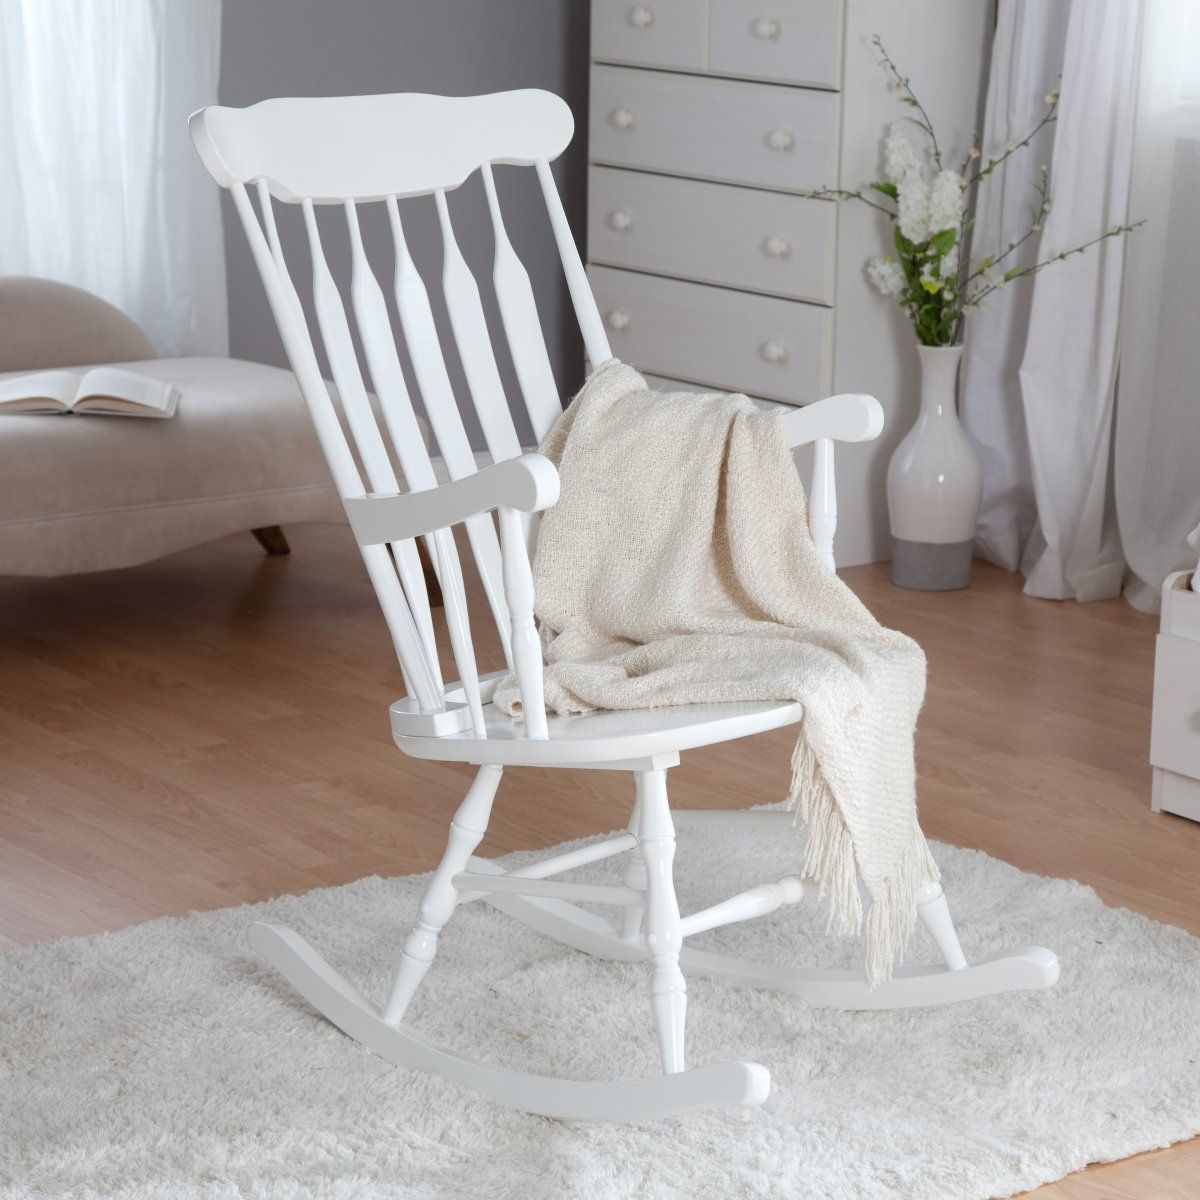 Kidkraft Nursery Rocker – White – Rocking Chairs At Intended For Wooden Baby Nursery Rocking Chairs (View 2 of 20)